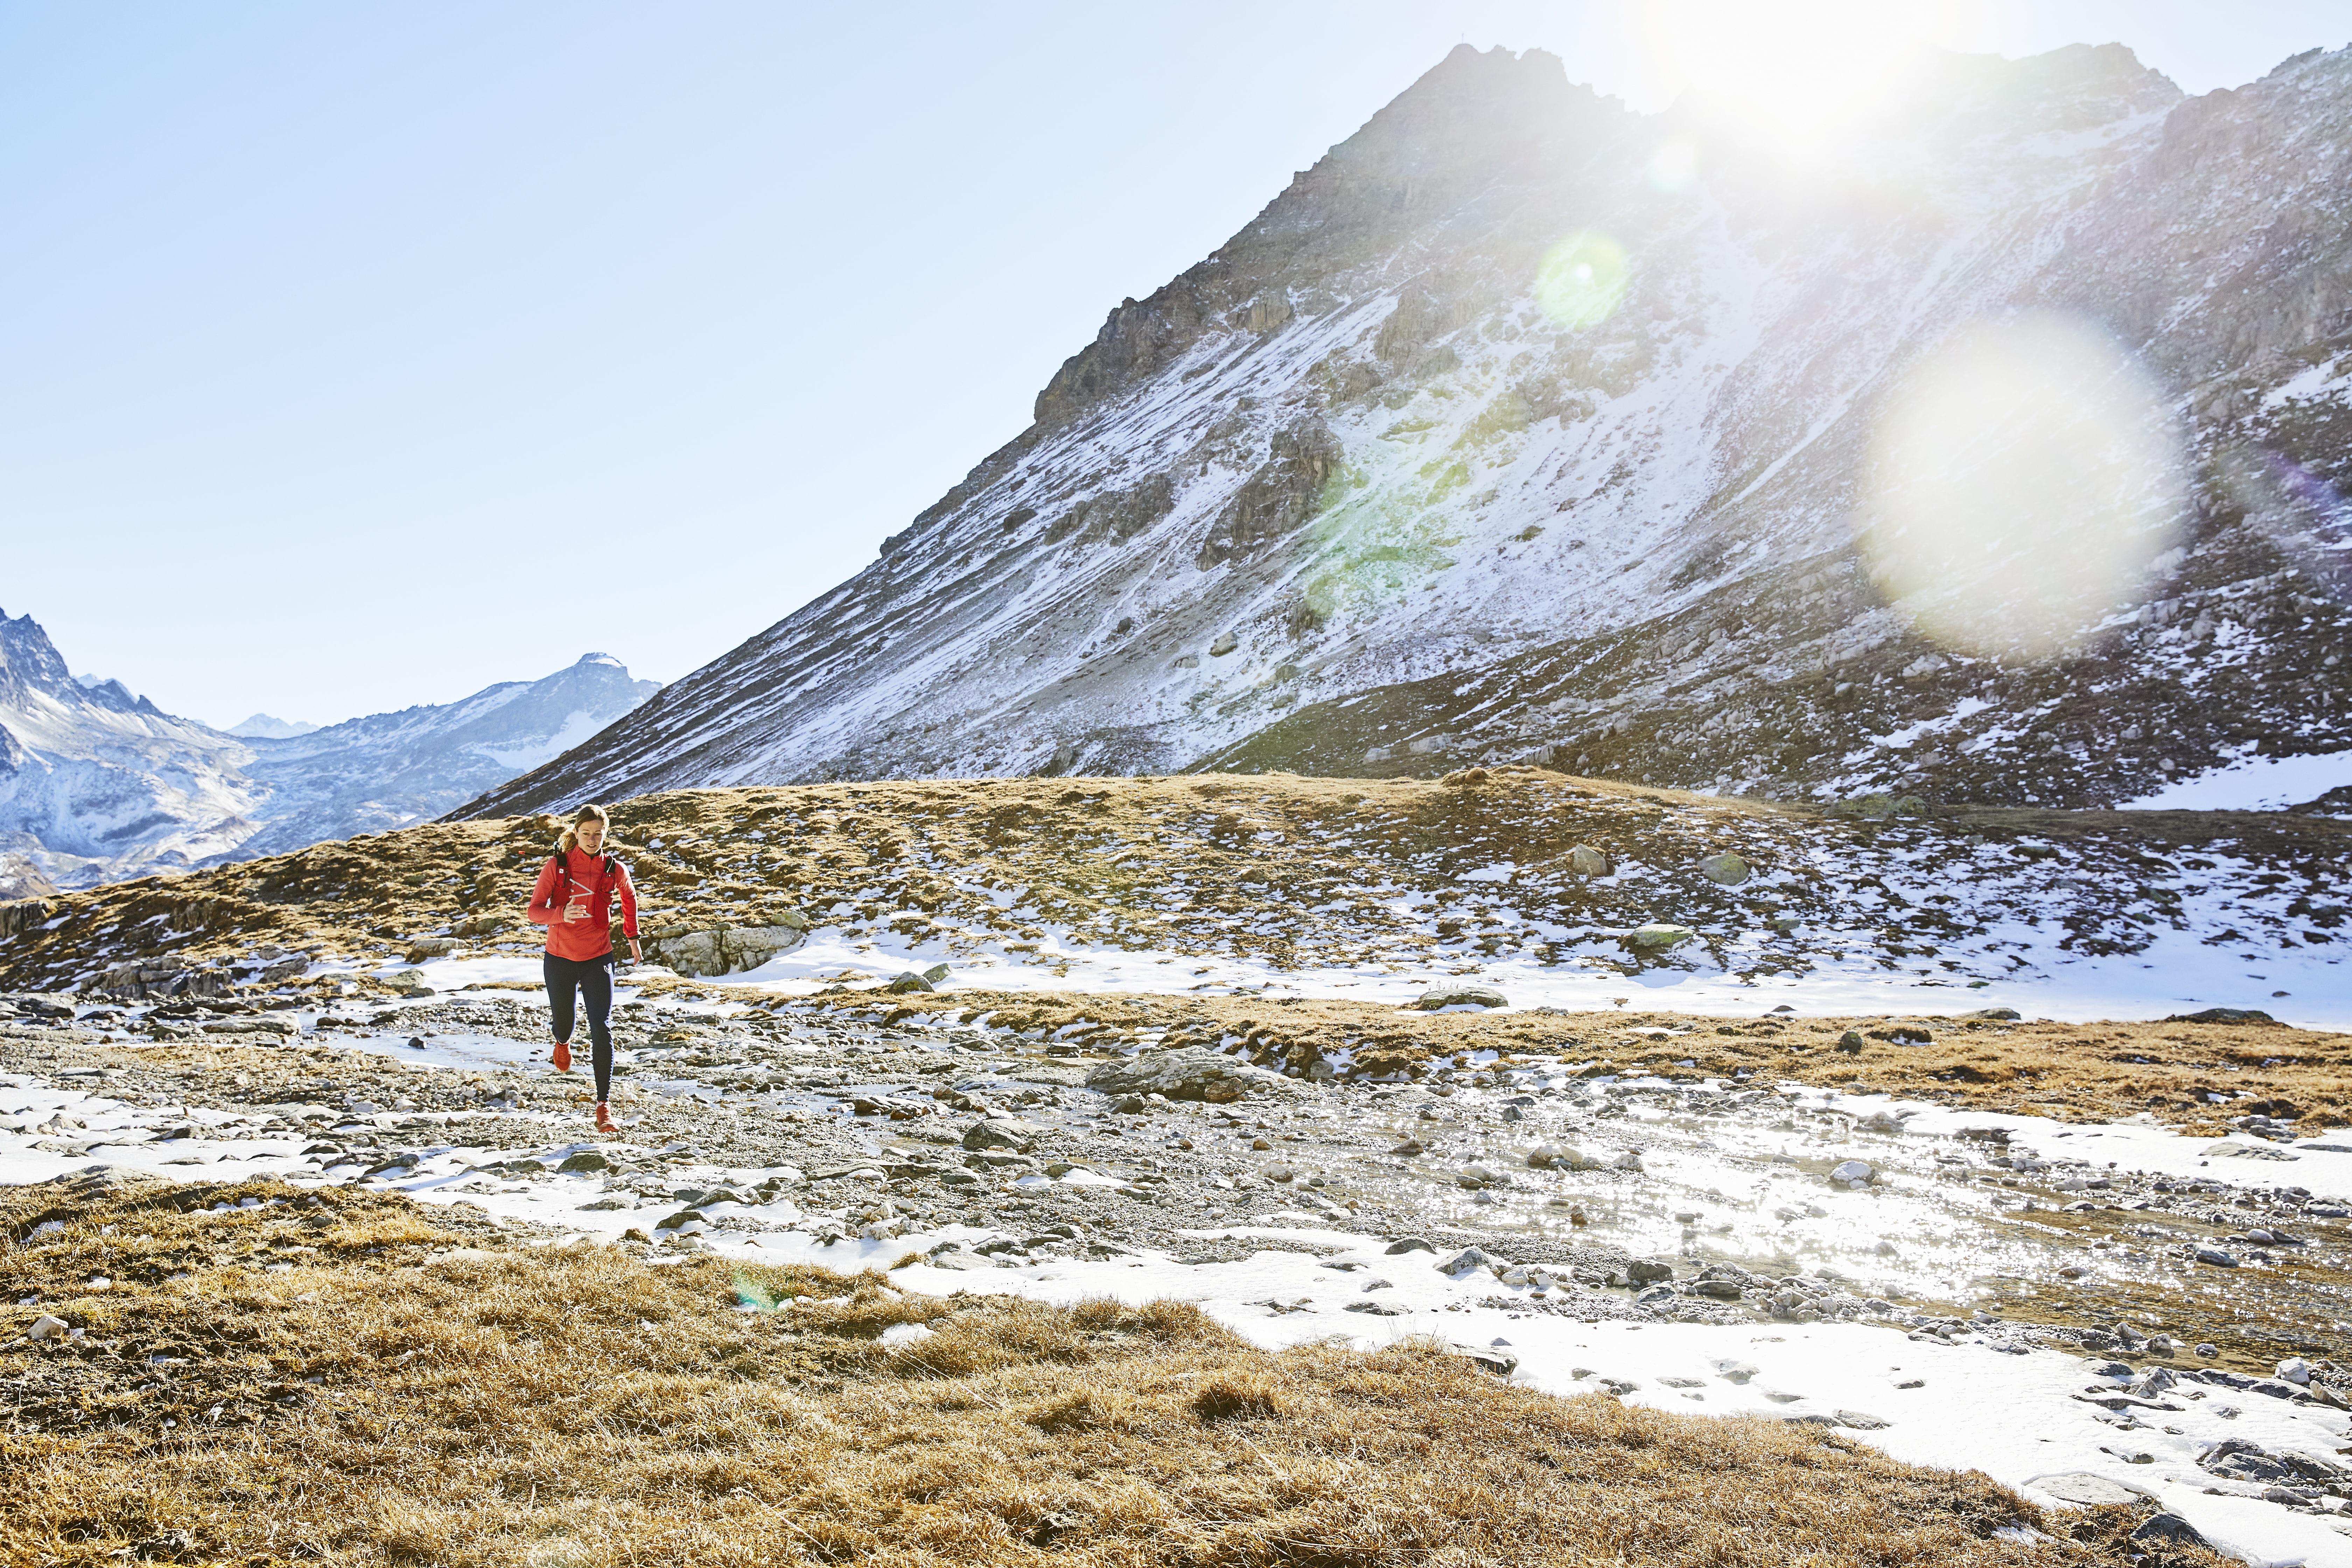 Anne-Marie Flammersfeld Winter Trailrunning